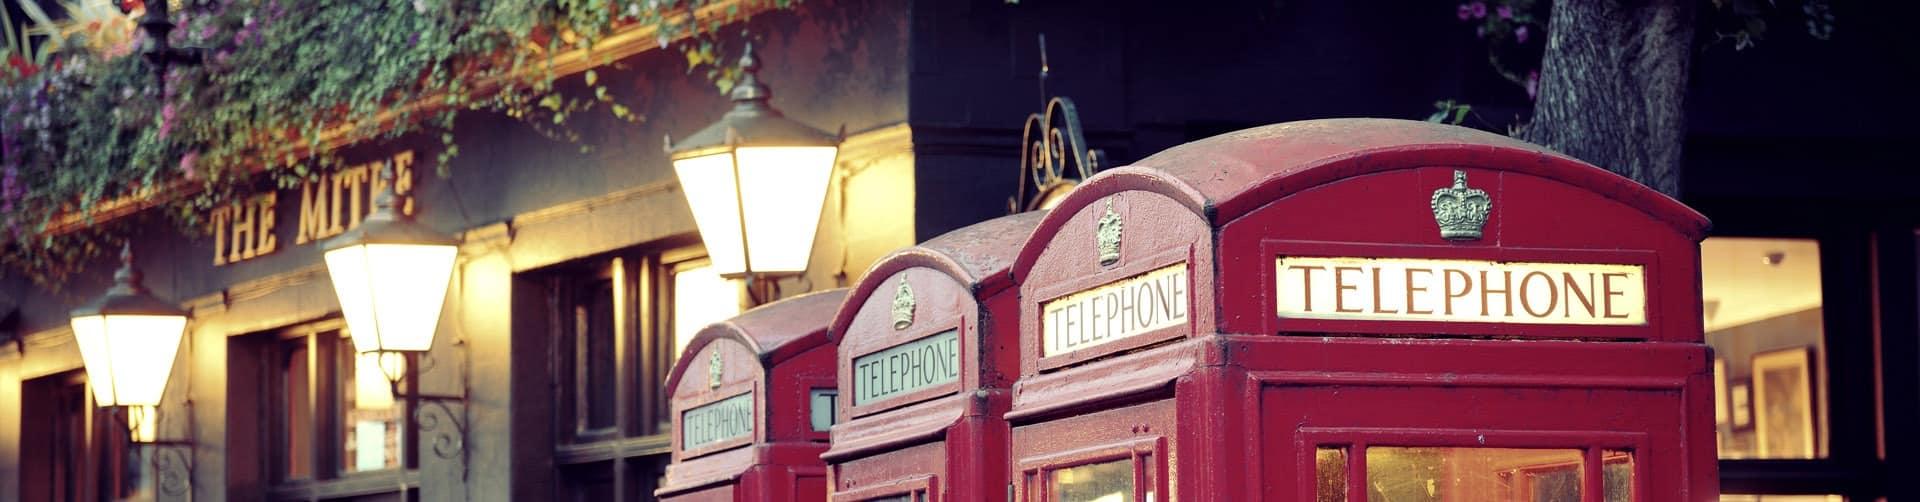 LONDON, UK – SEP 27: London Street view with telephone box on Se